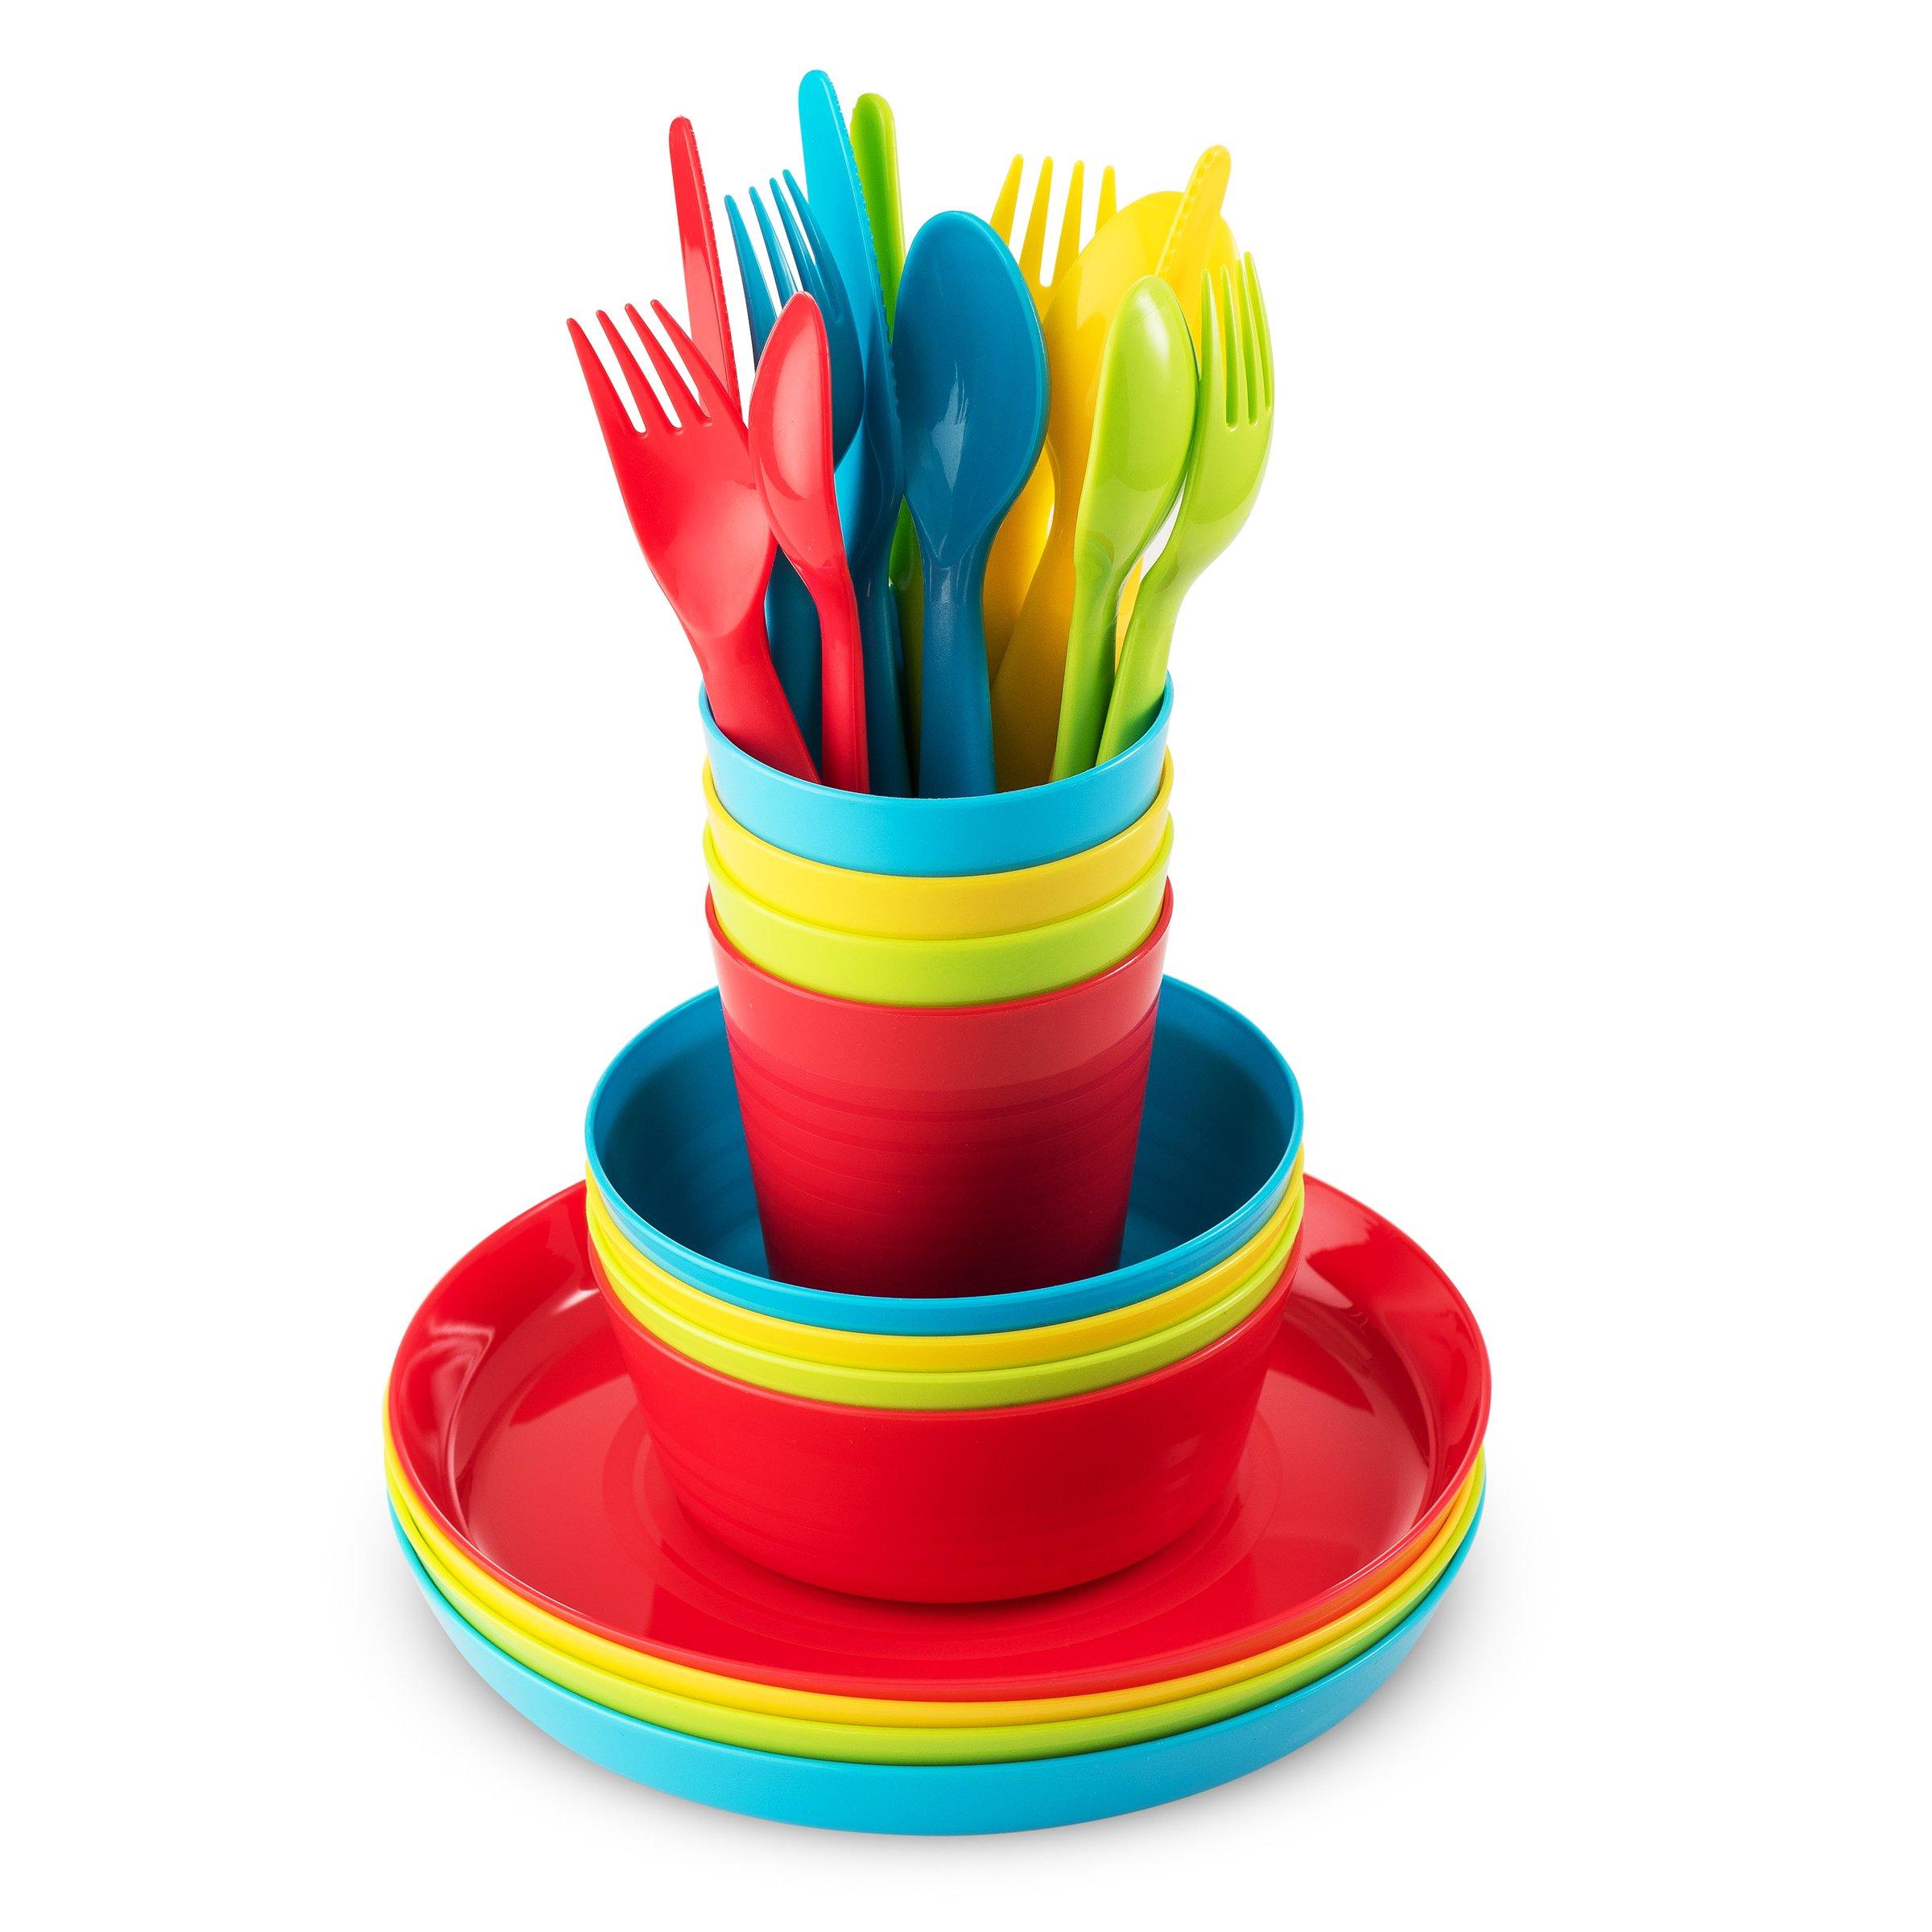 Plastic Dinnerware Set of 4 By Plaskidy - 24 piece Kids dishes Set Includes, Kids Cups, Kids Plates, Kids Bowls, Flatware Set, Kids dinnerware set is Reusable, Microwave - Dishwasher Safe, BPA Free. by PLASKIDY